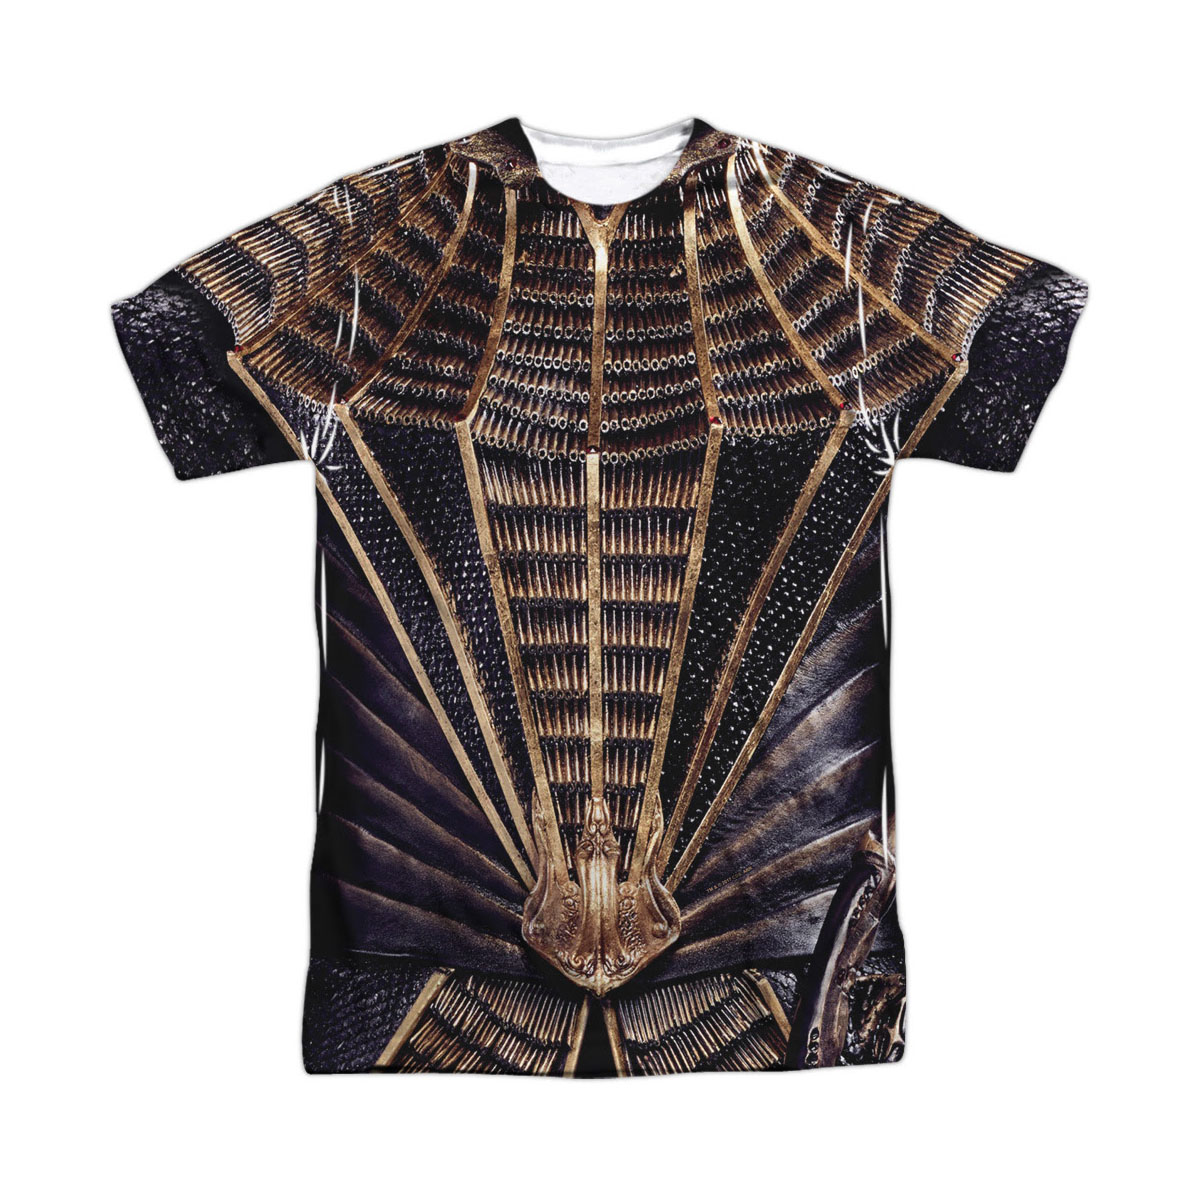 T'Kuvma Uniform T-Shirt